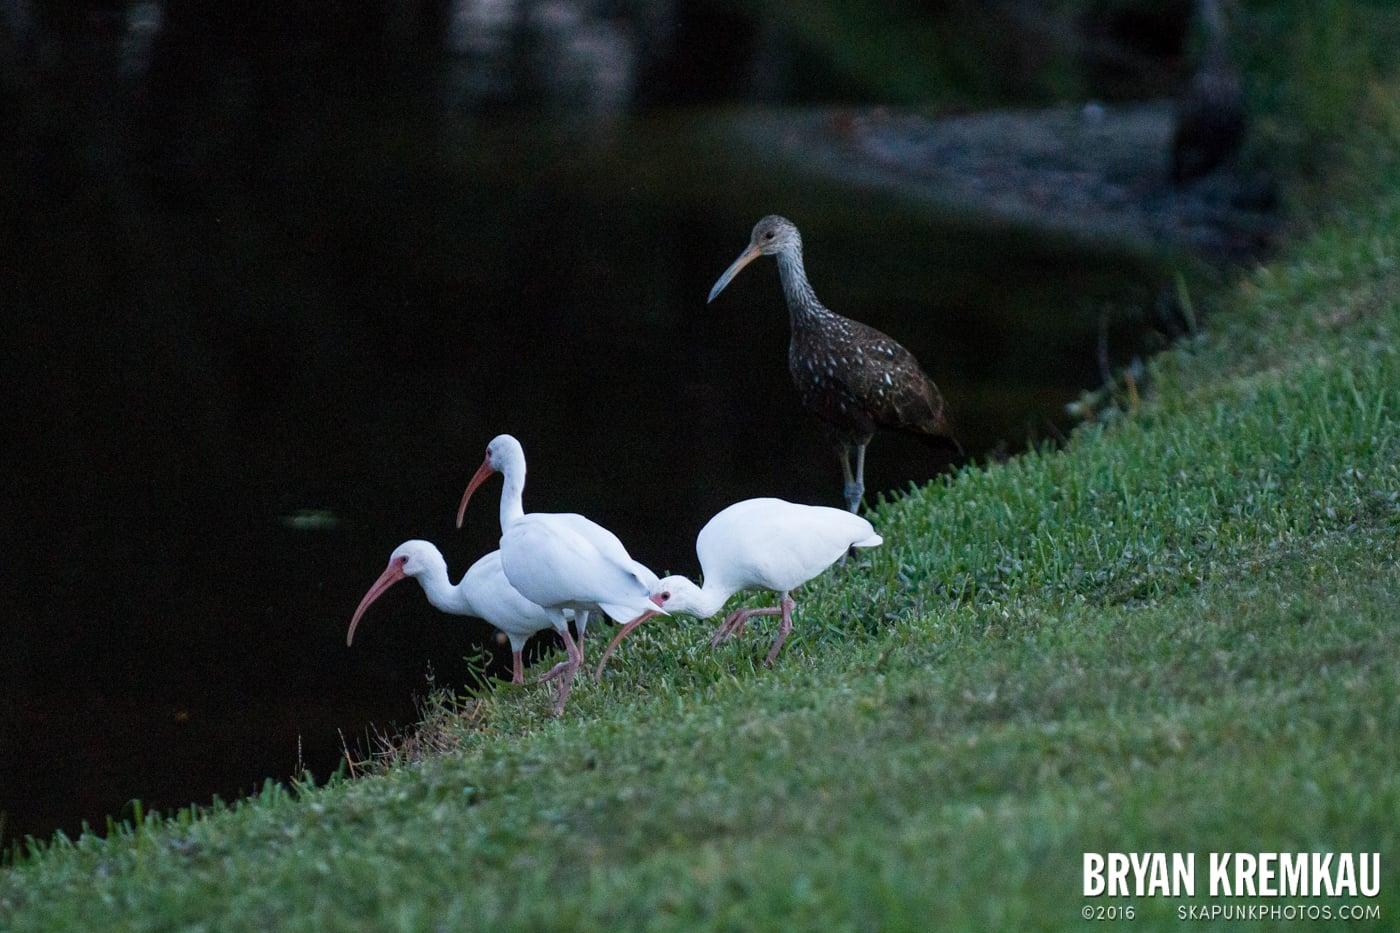 Sunsets, Astrophotography & Birds @ Venice, Florida - 10.25.14 - 11.5.14 (11)